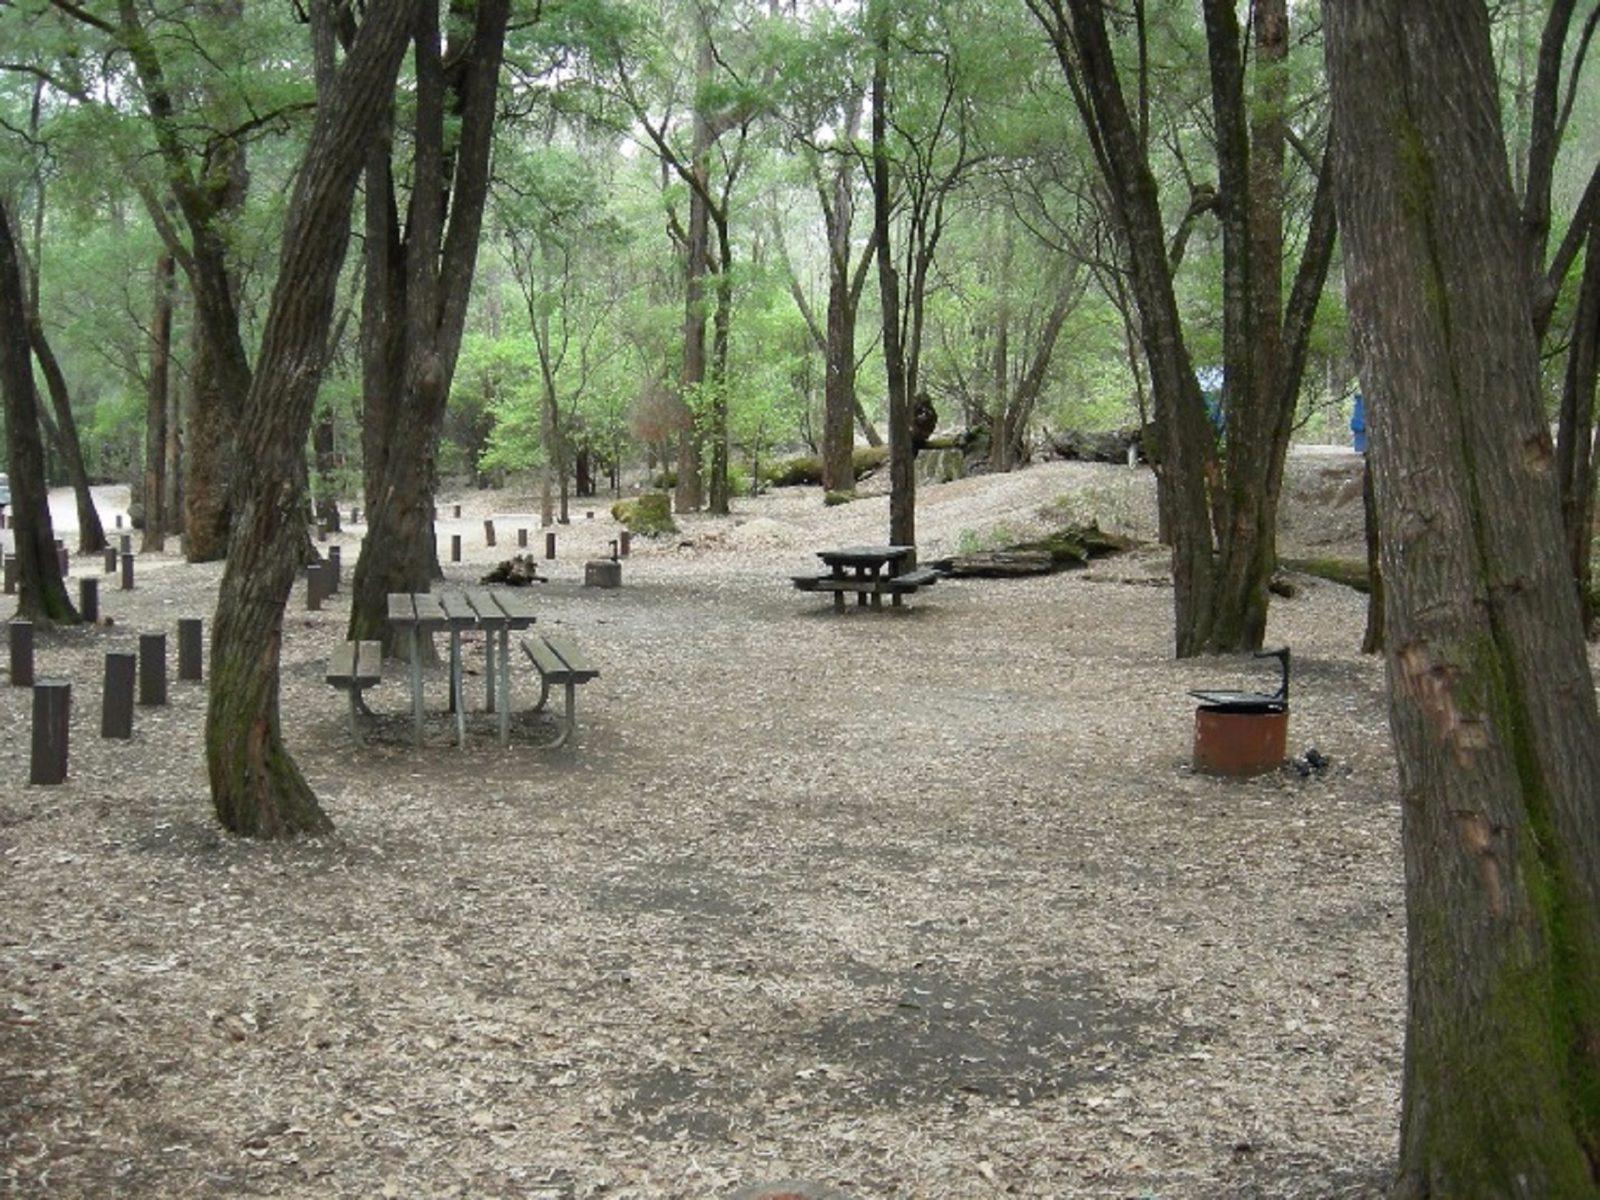 Honeymoon Pool Camp, Wellington National Park